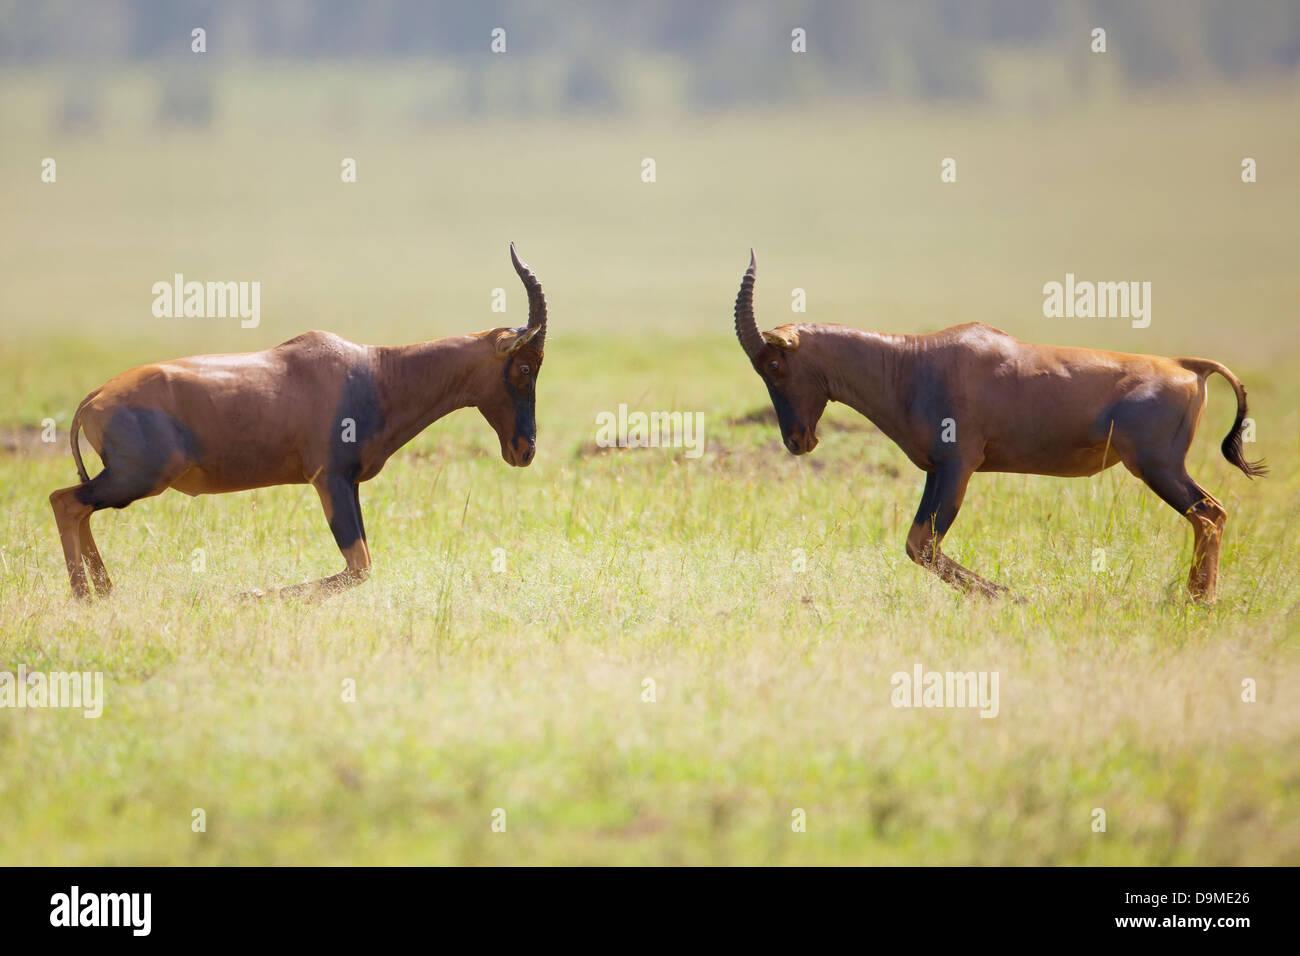 Topis fighting, Masai Mara,Kenya - Stock Image